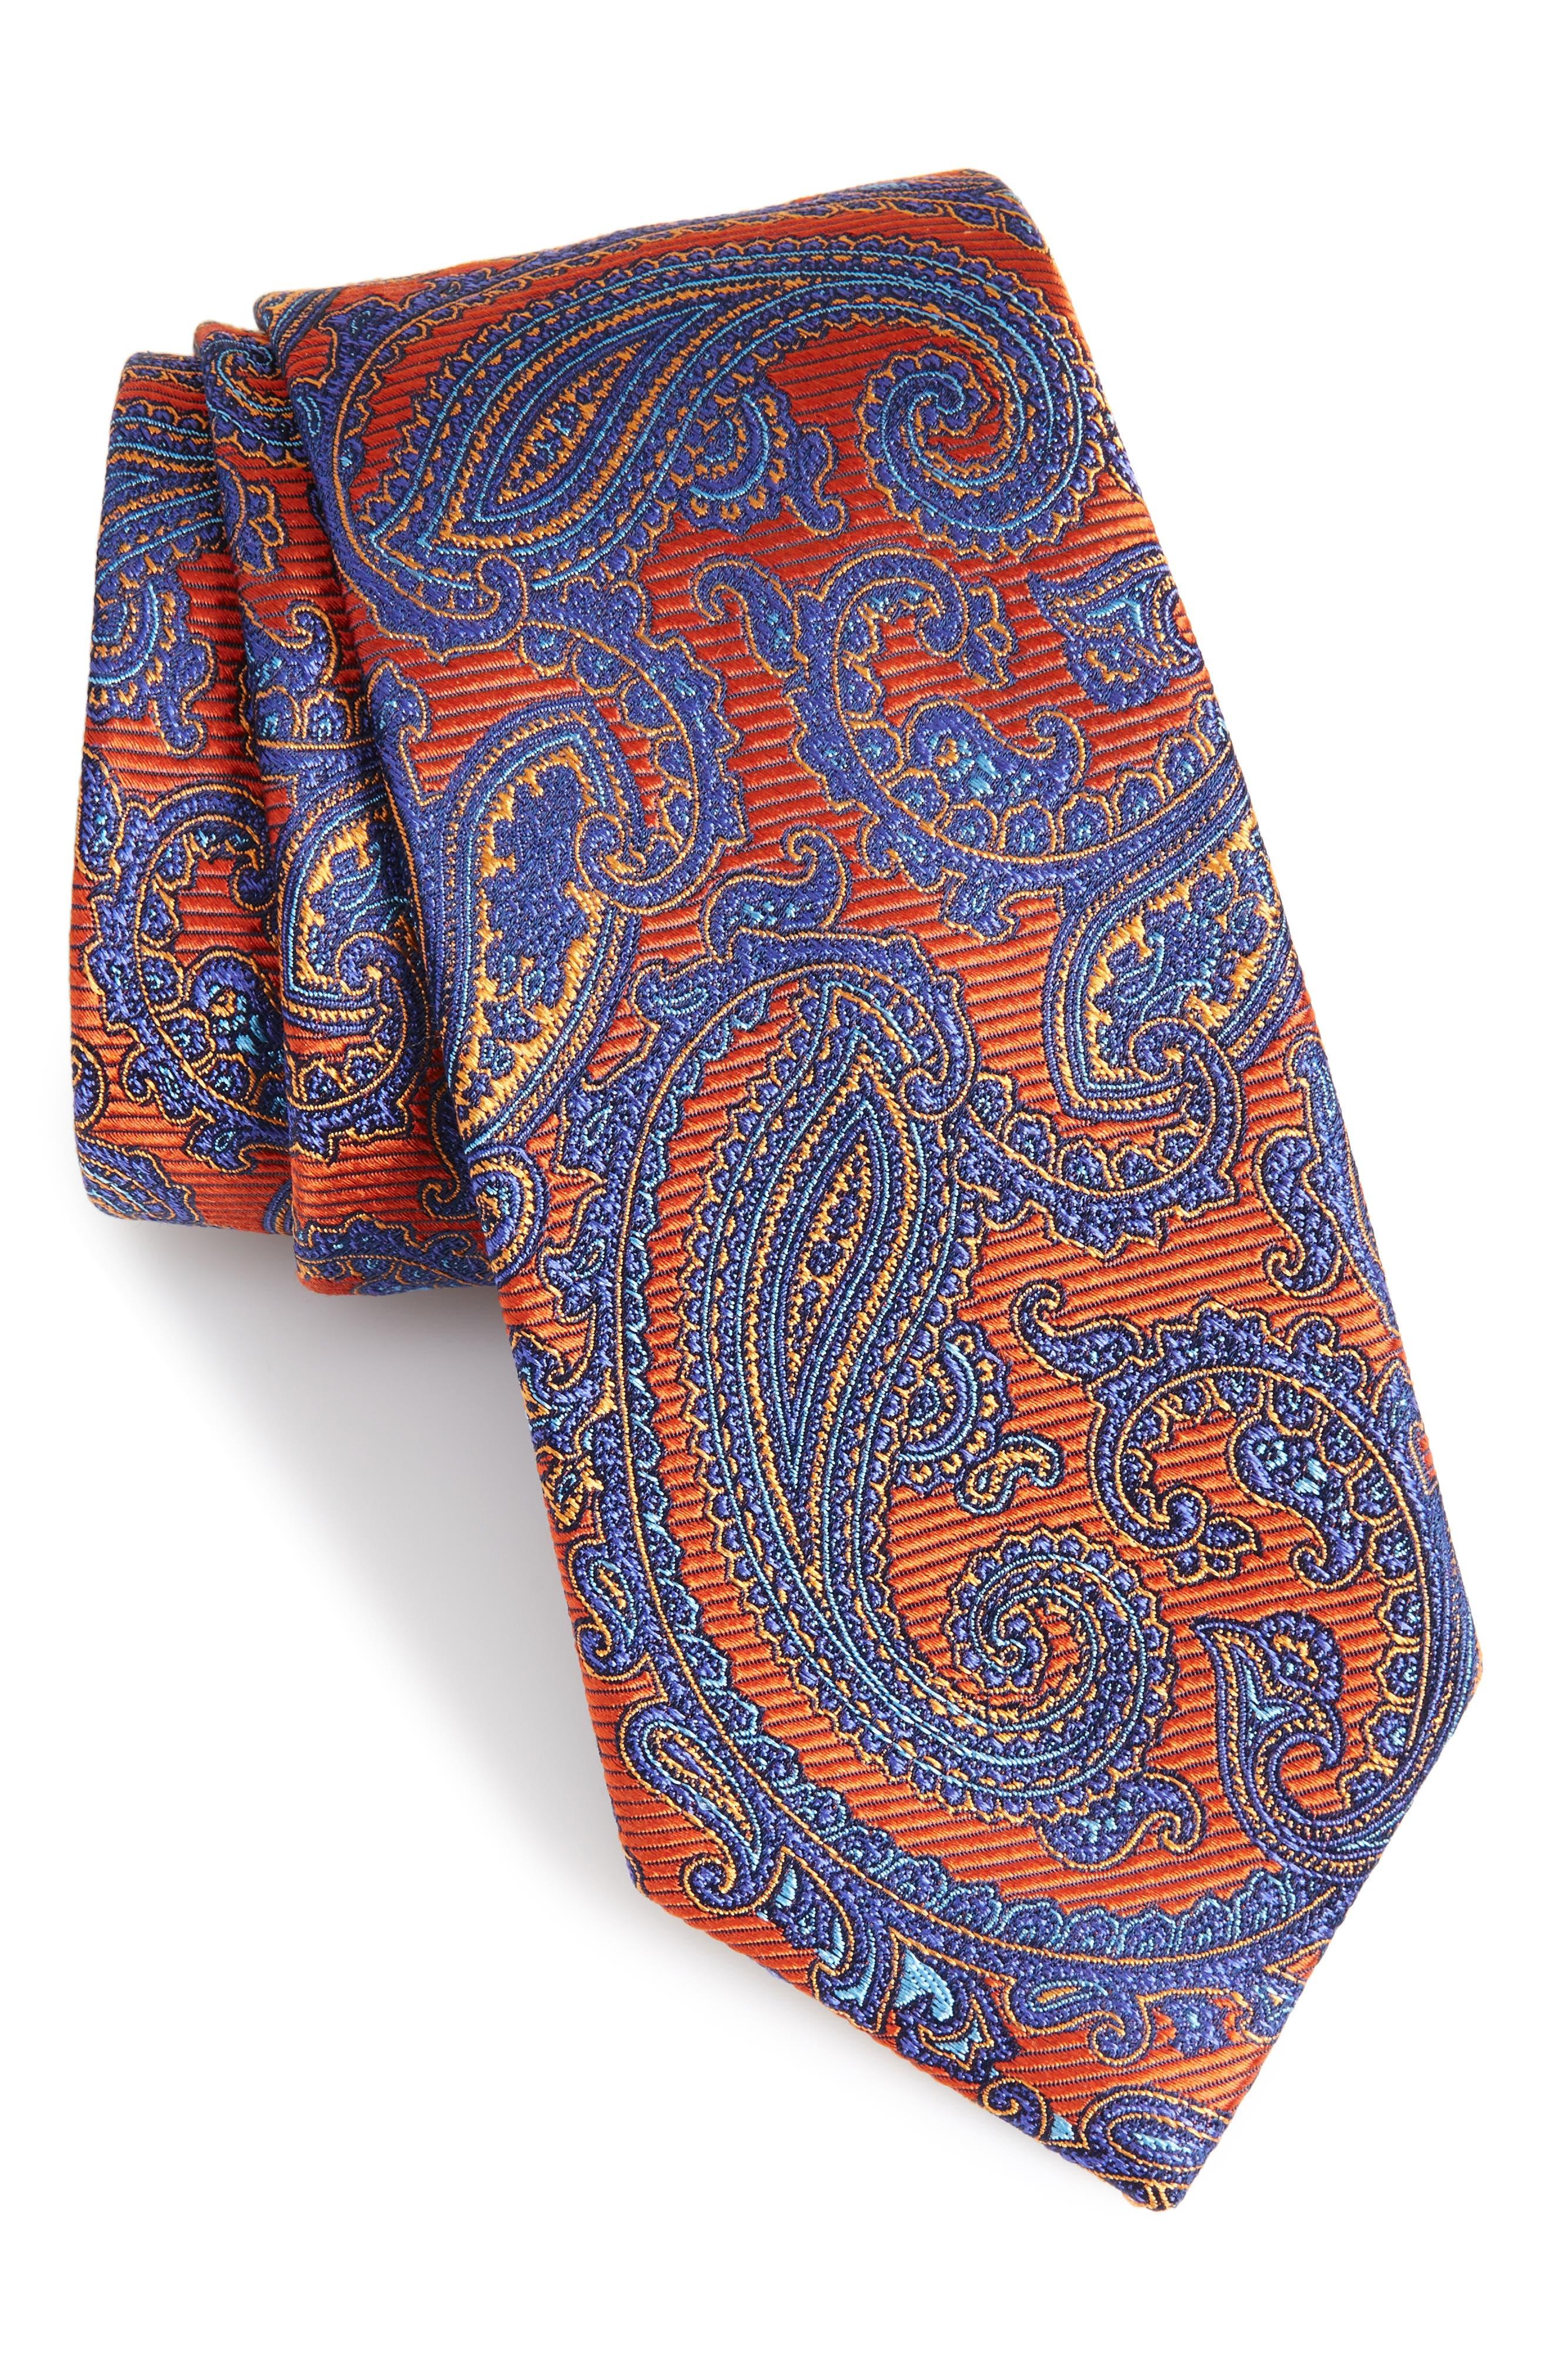 Main Image - Nordstrom Men's Shop Brielle Paisley Silk Tie